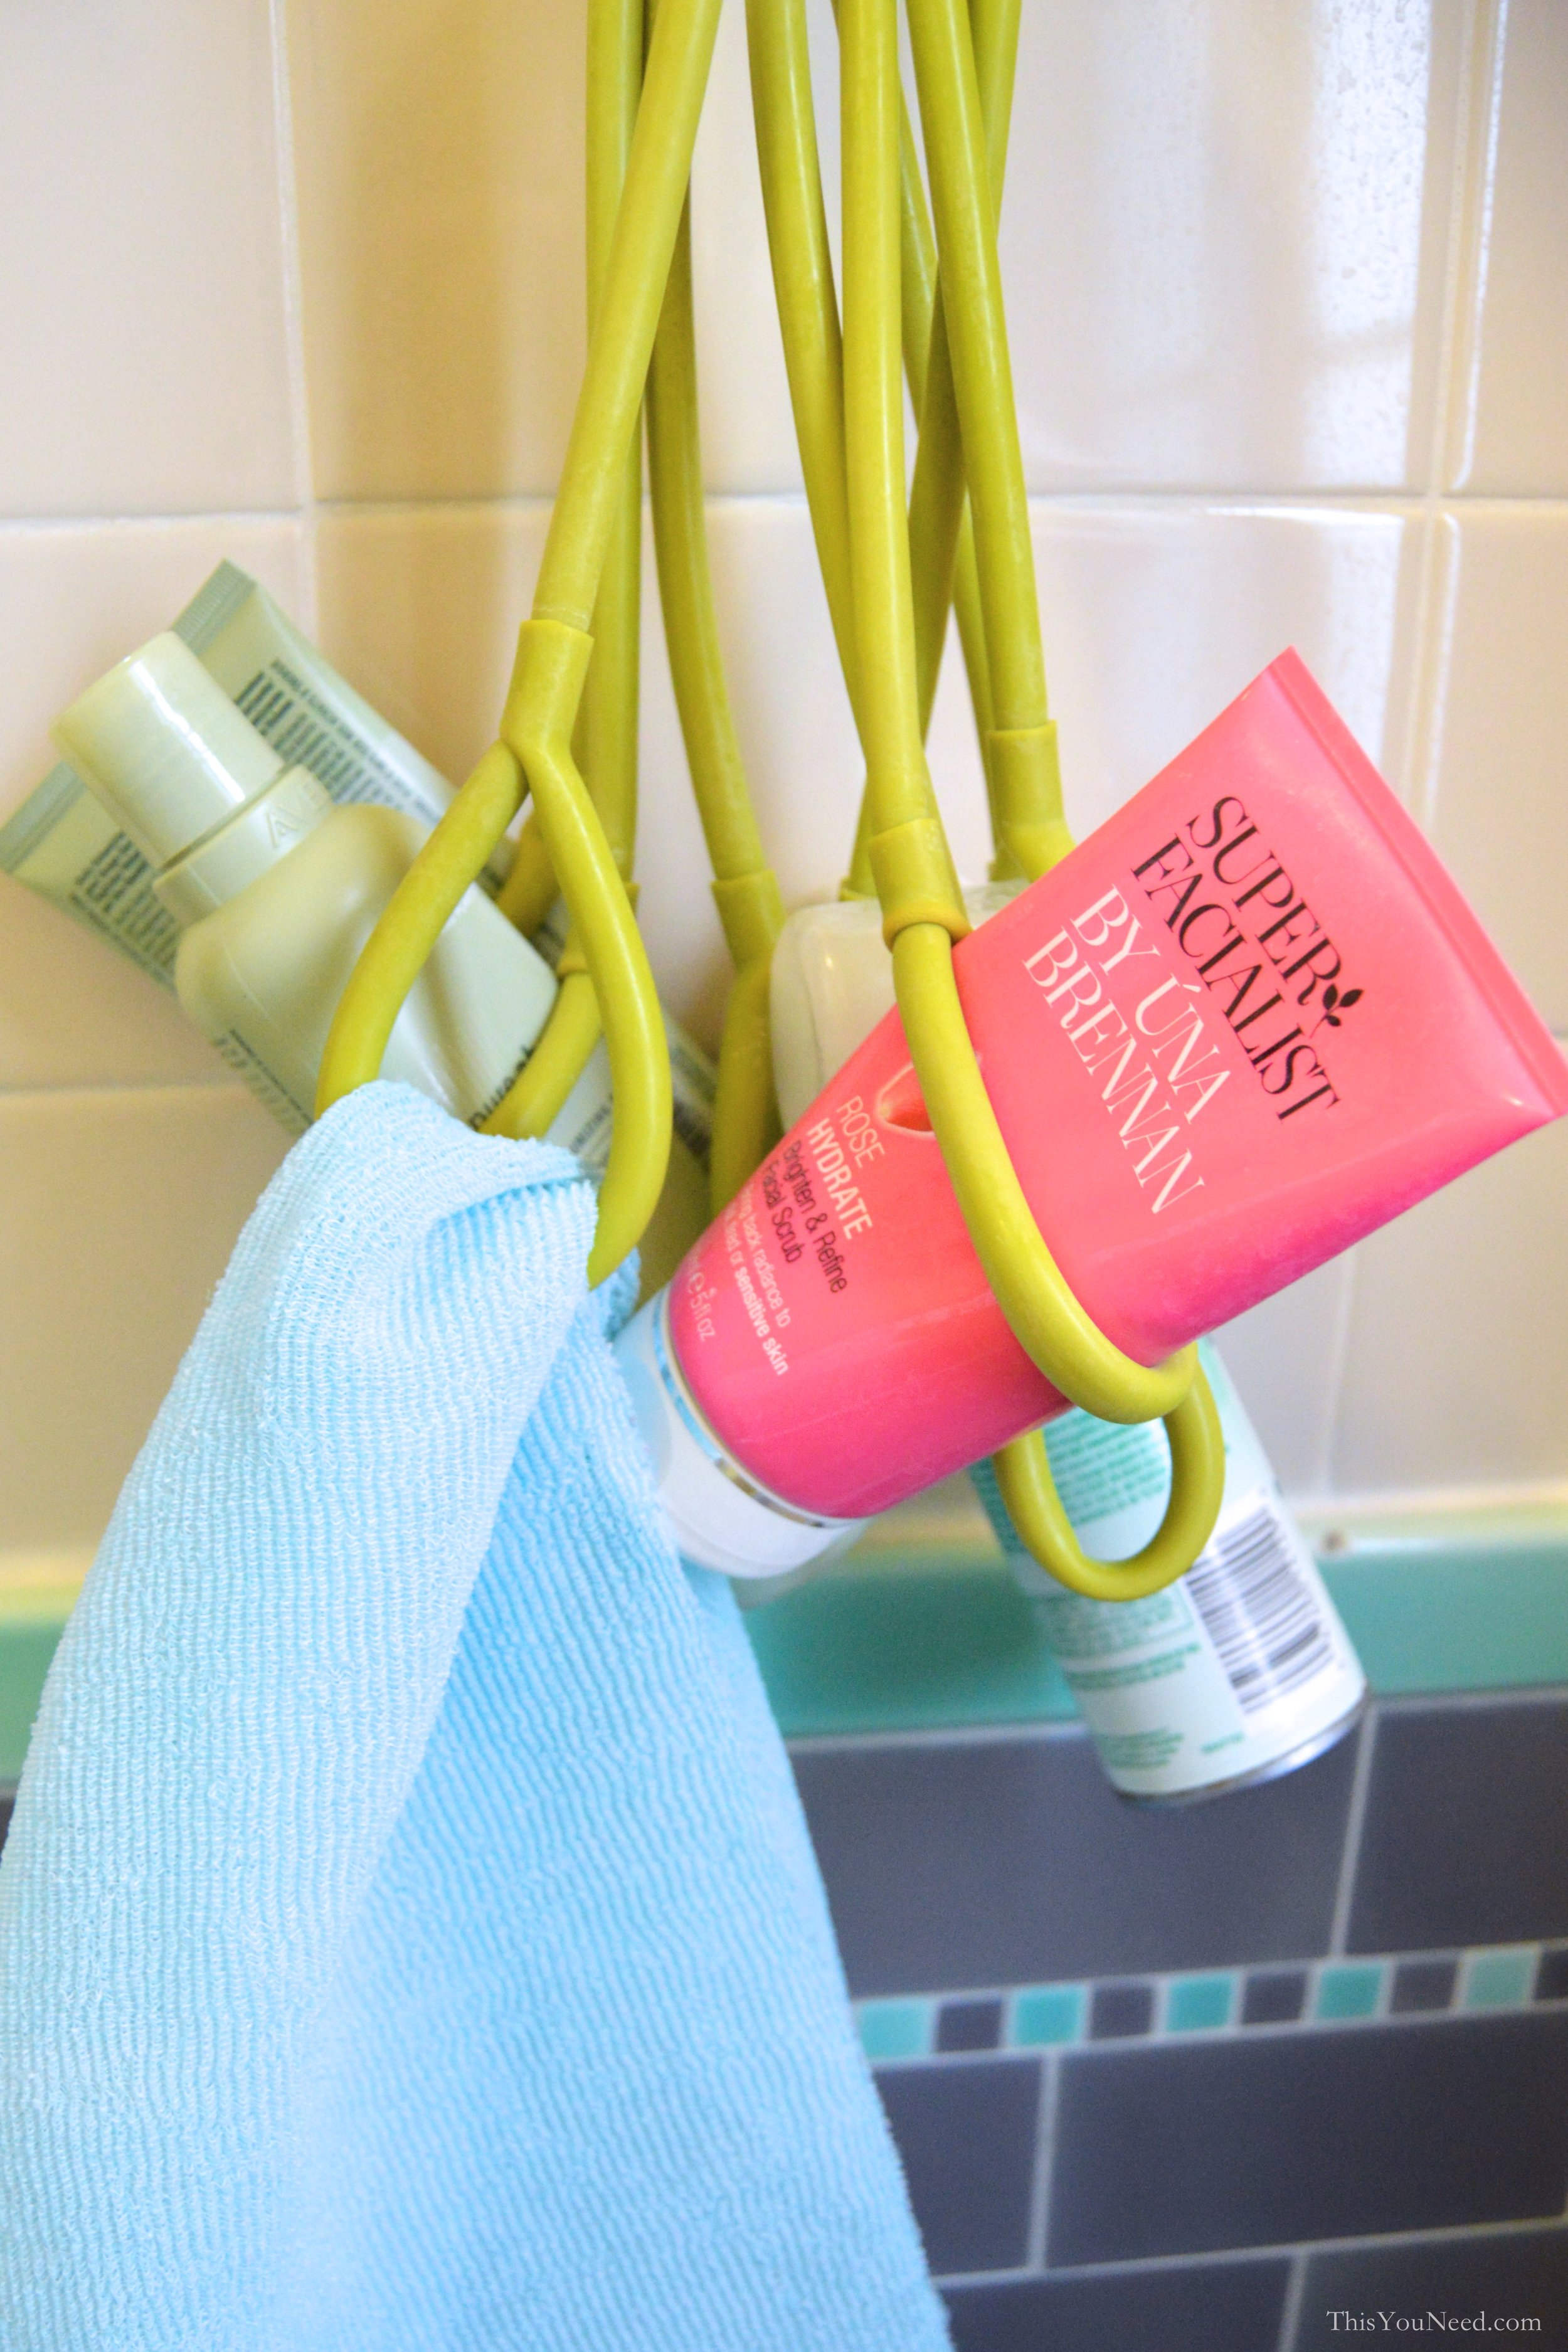 Shower-Squid-Salux.jpg